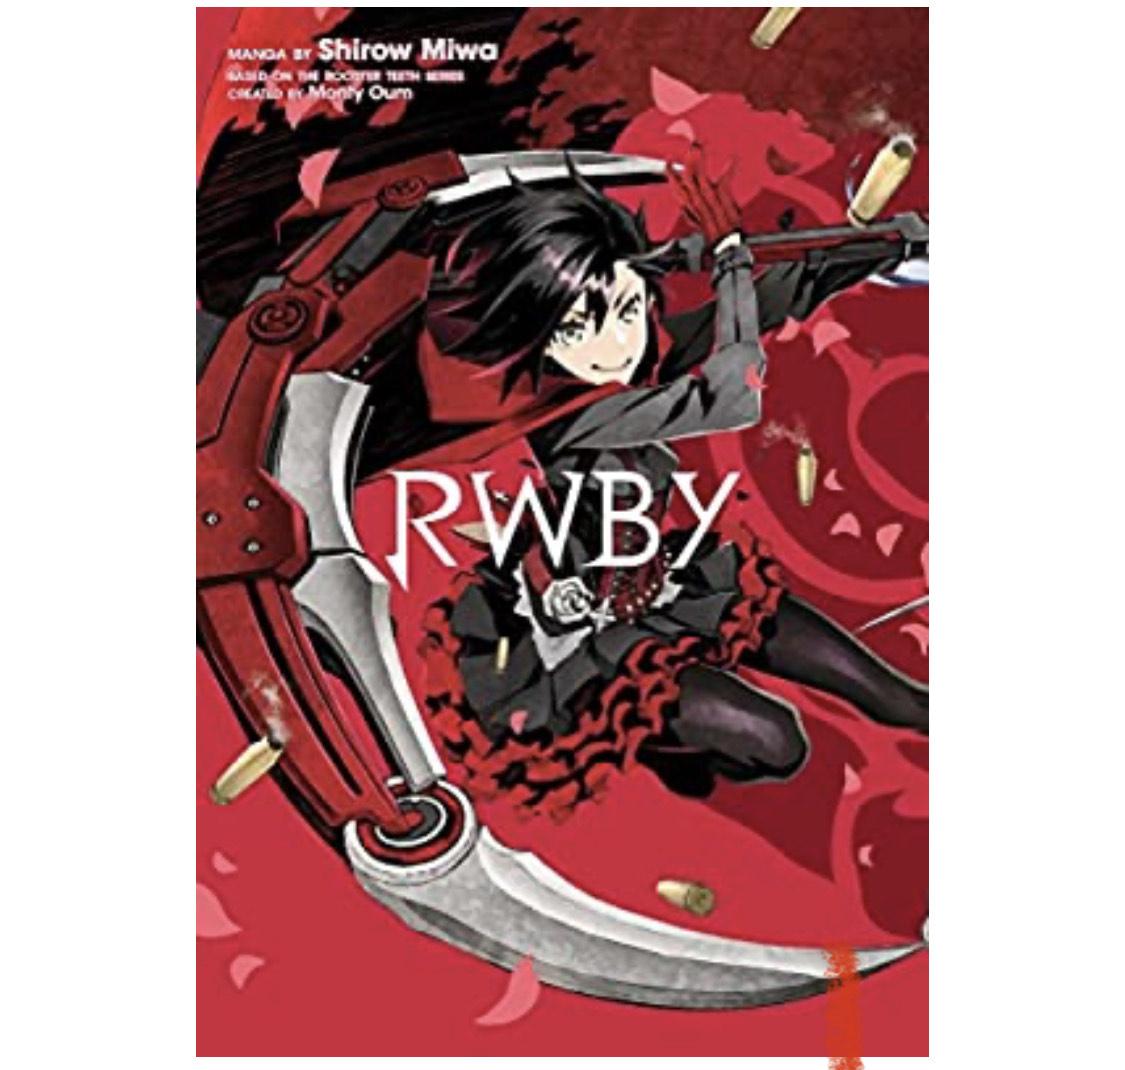 Rwby: 1 Paperback – Illustrated, 8 Feb. 2018 Manga £2.99 prime / £5.98 nonPrime @ Amazon